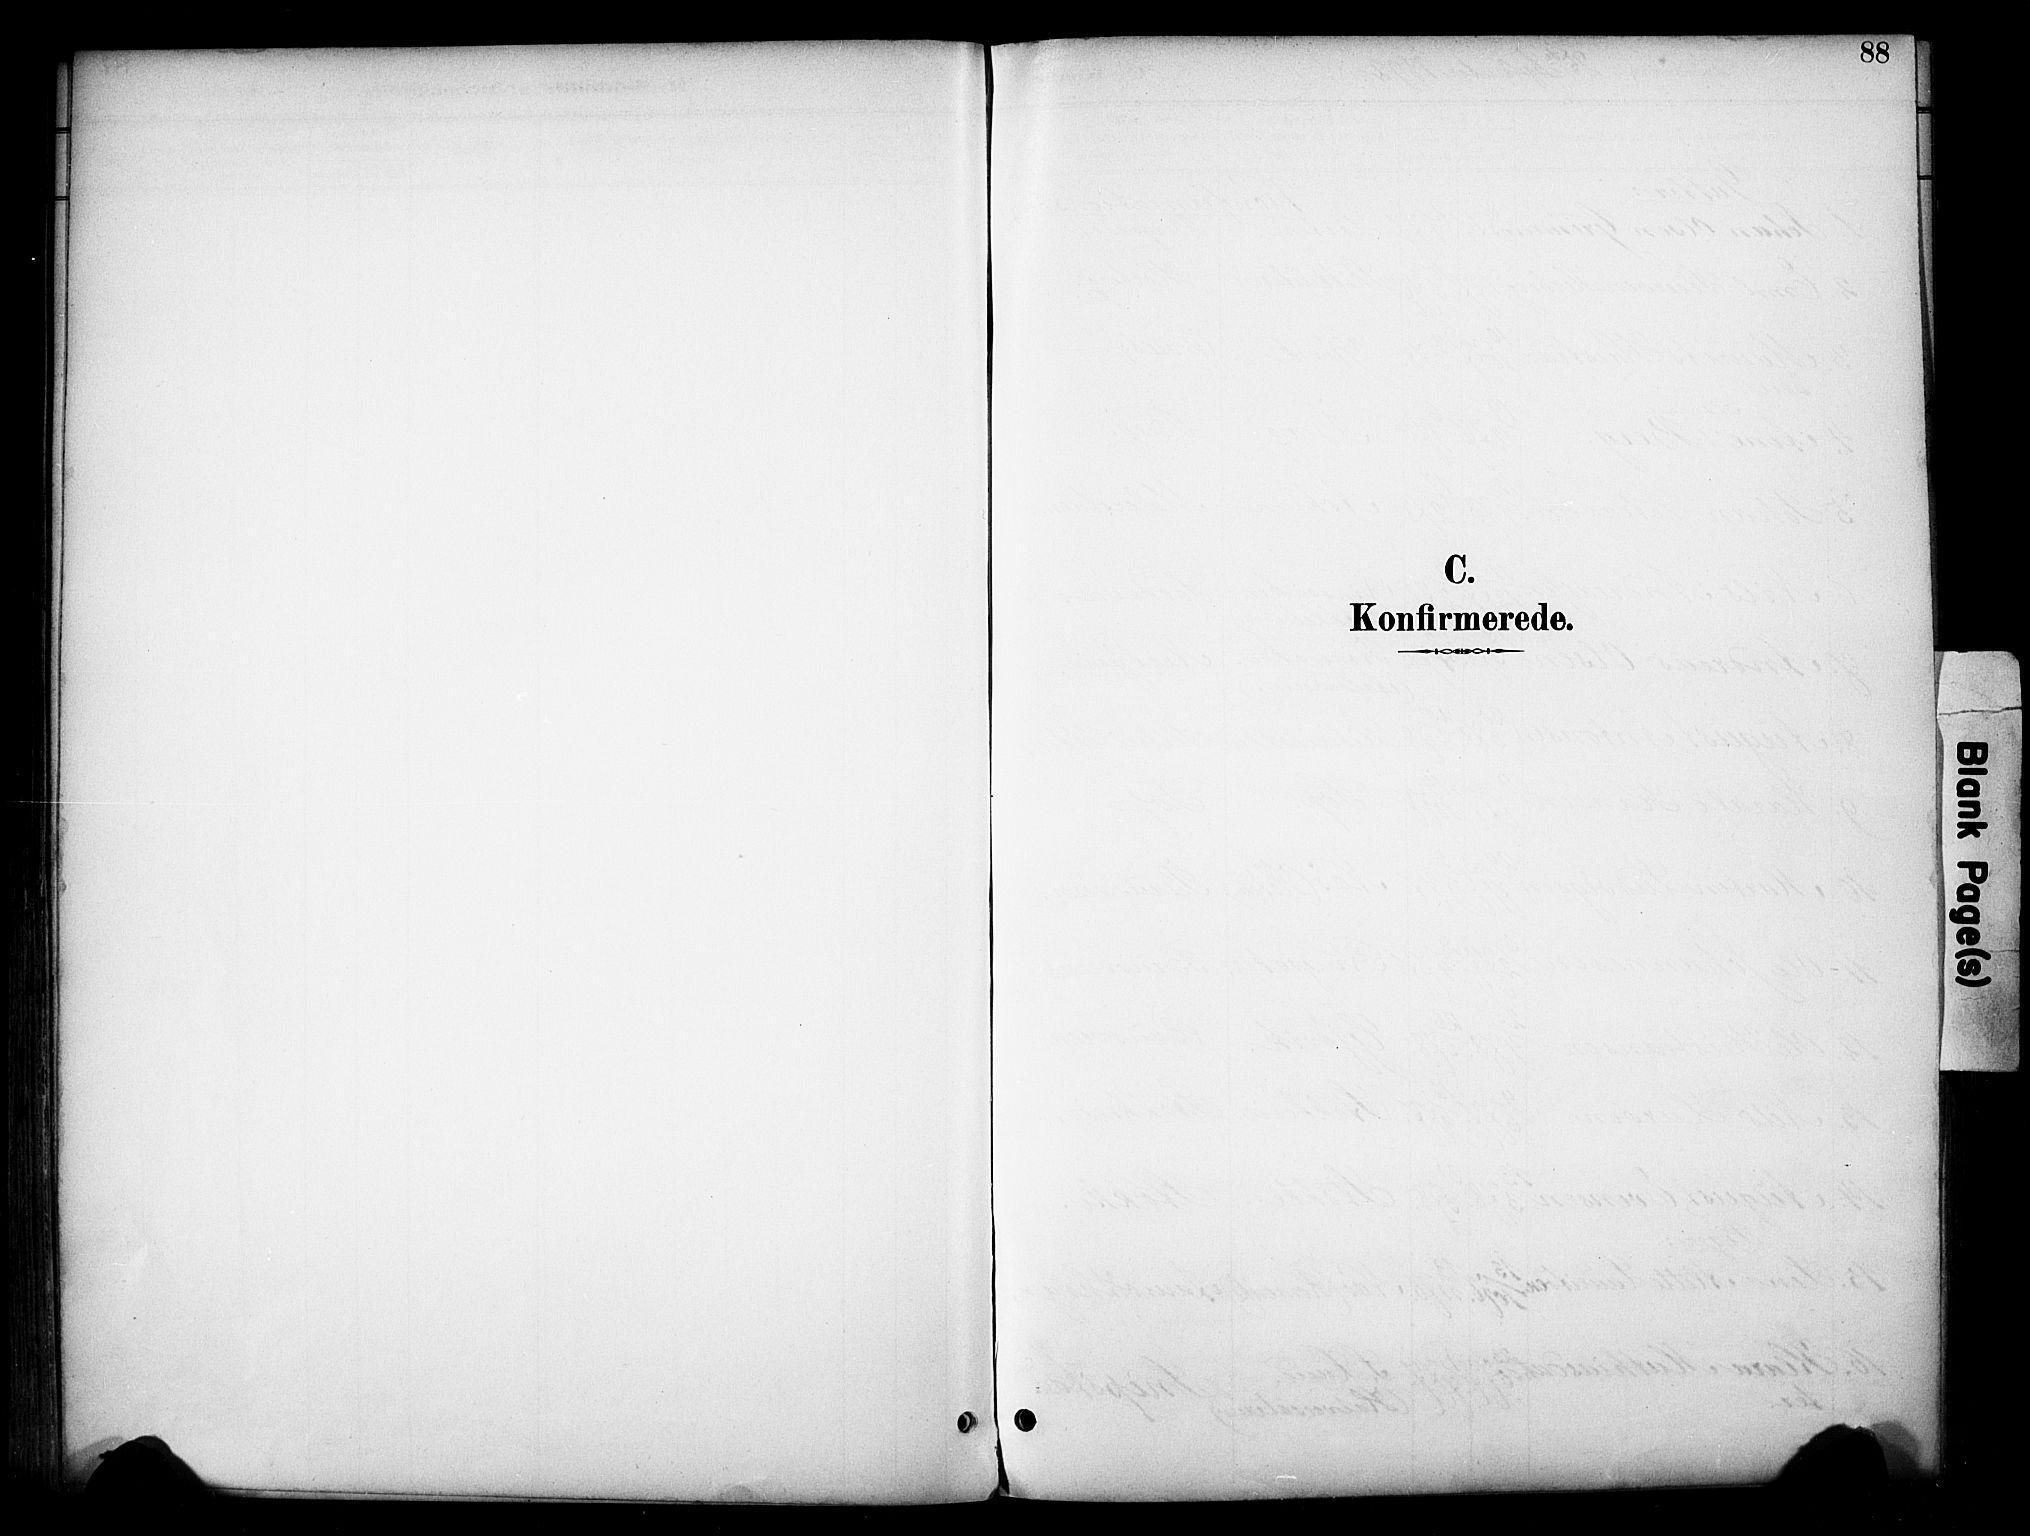 SAH, Vardal prestekontor, H/Ha/Haa/L0012: Ministerialbok nr. 12, 1893-1904, s. 88